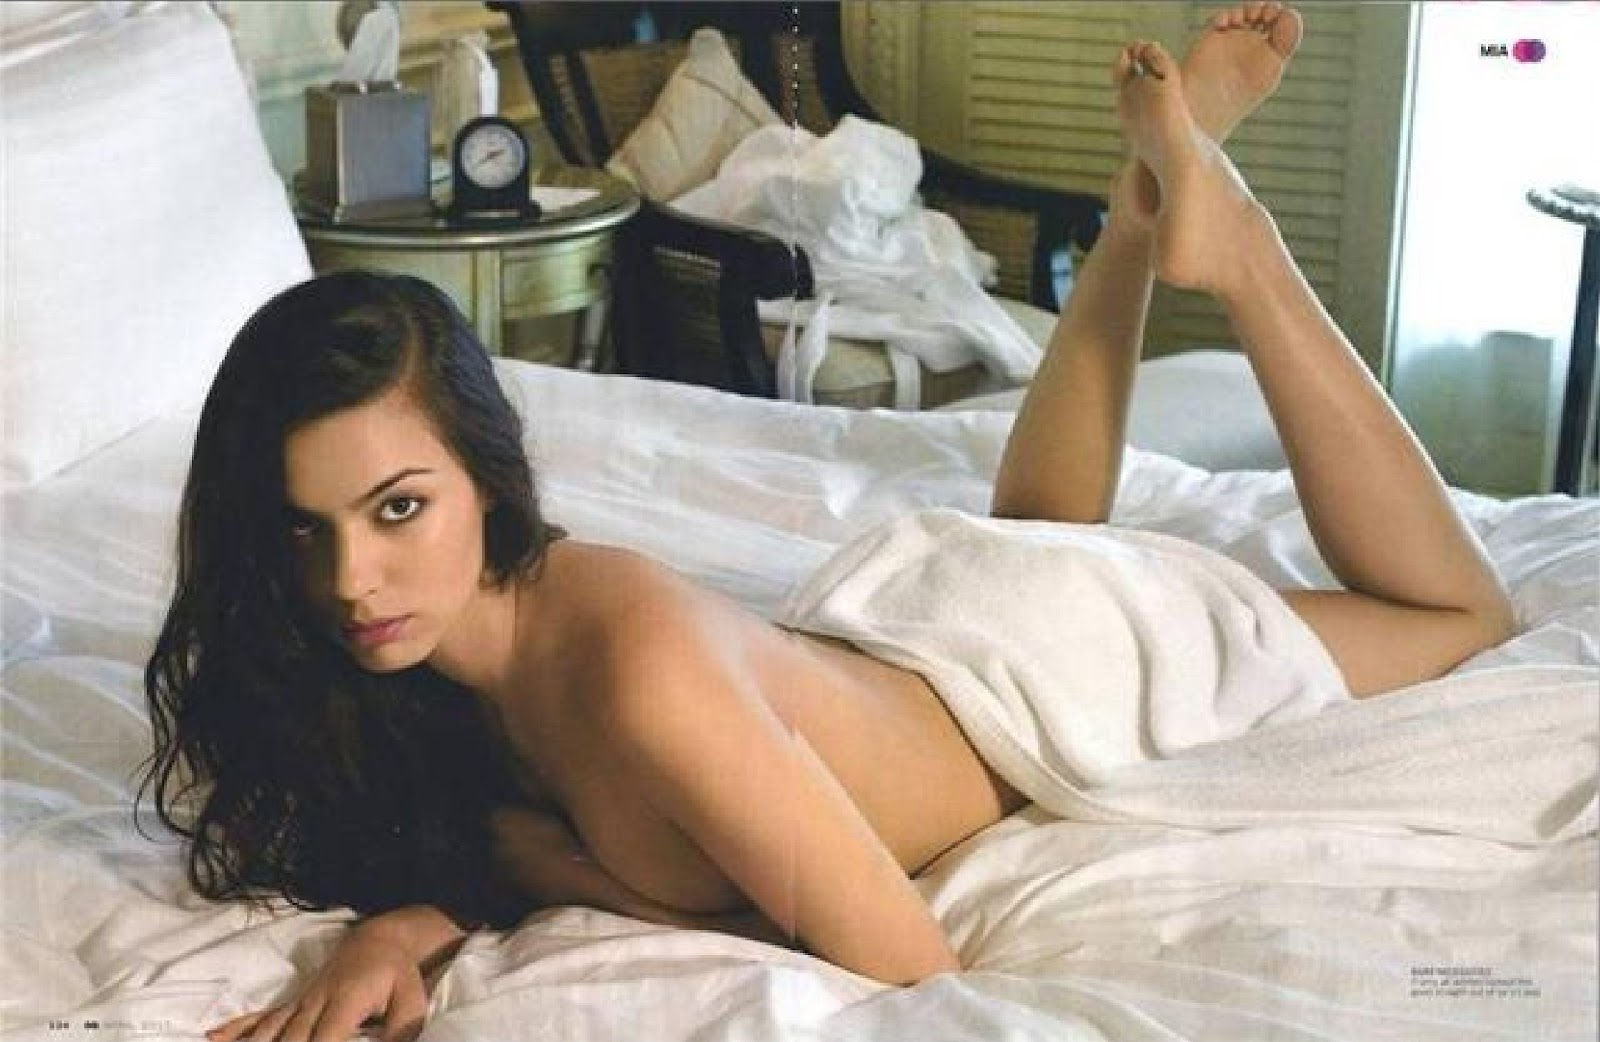 Bollywood Photo Gallery: Hot Model and VJ Mia Uyeda Real HD Photoshoot ...